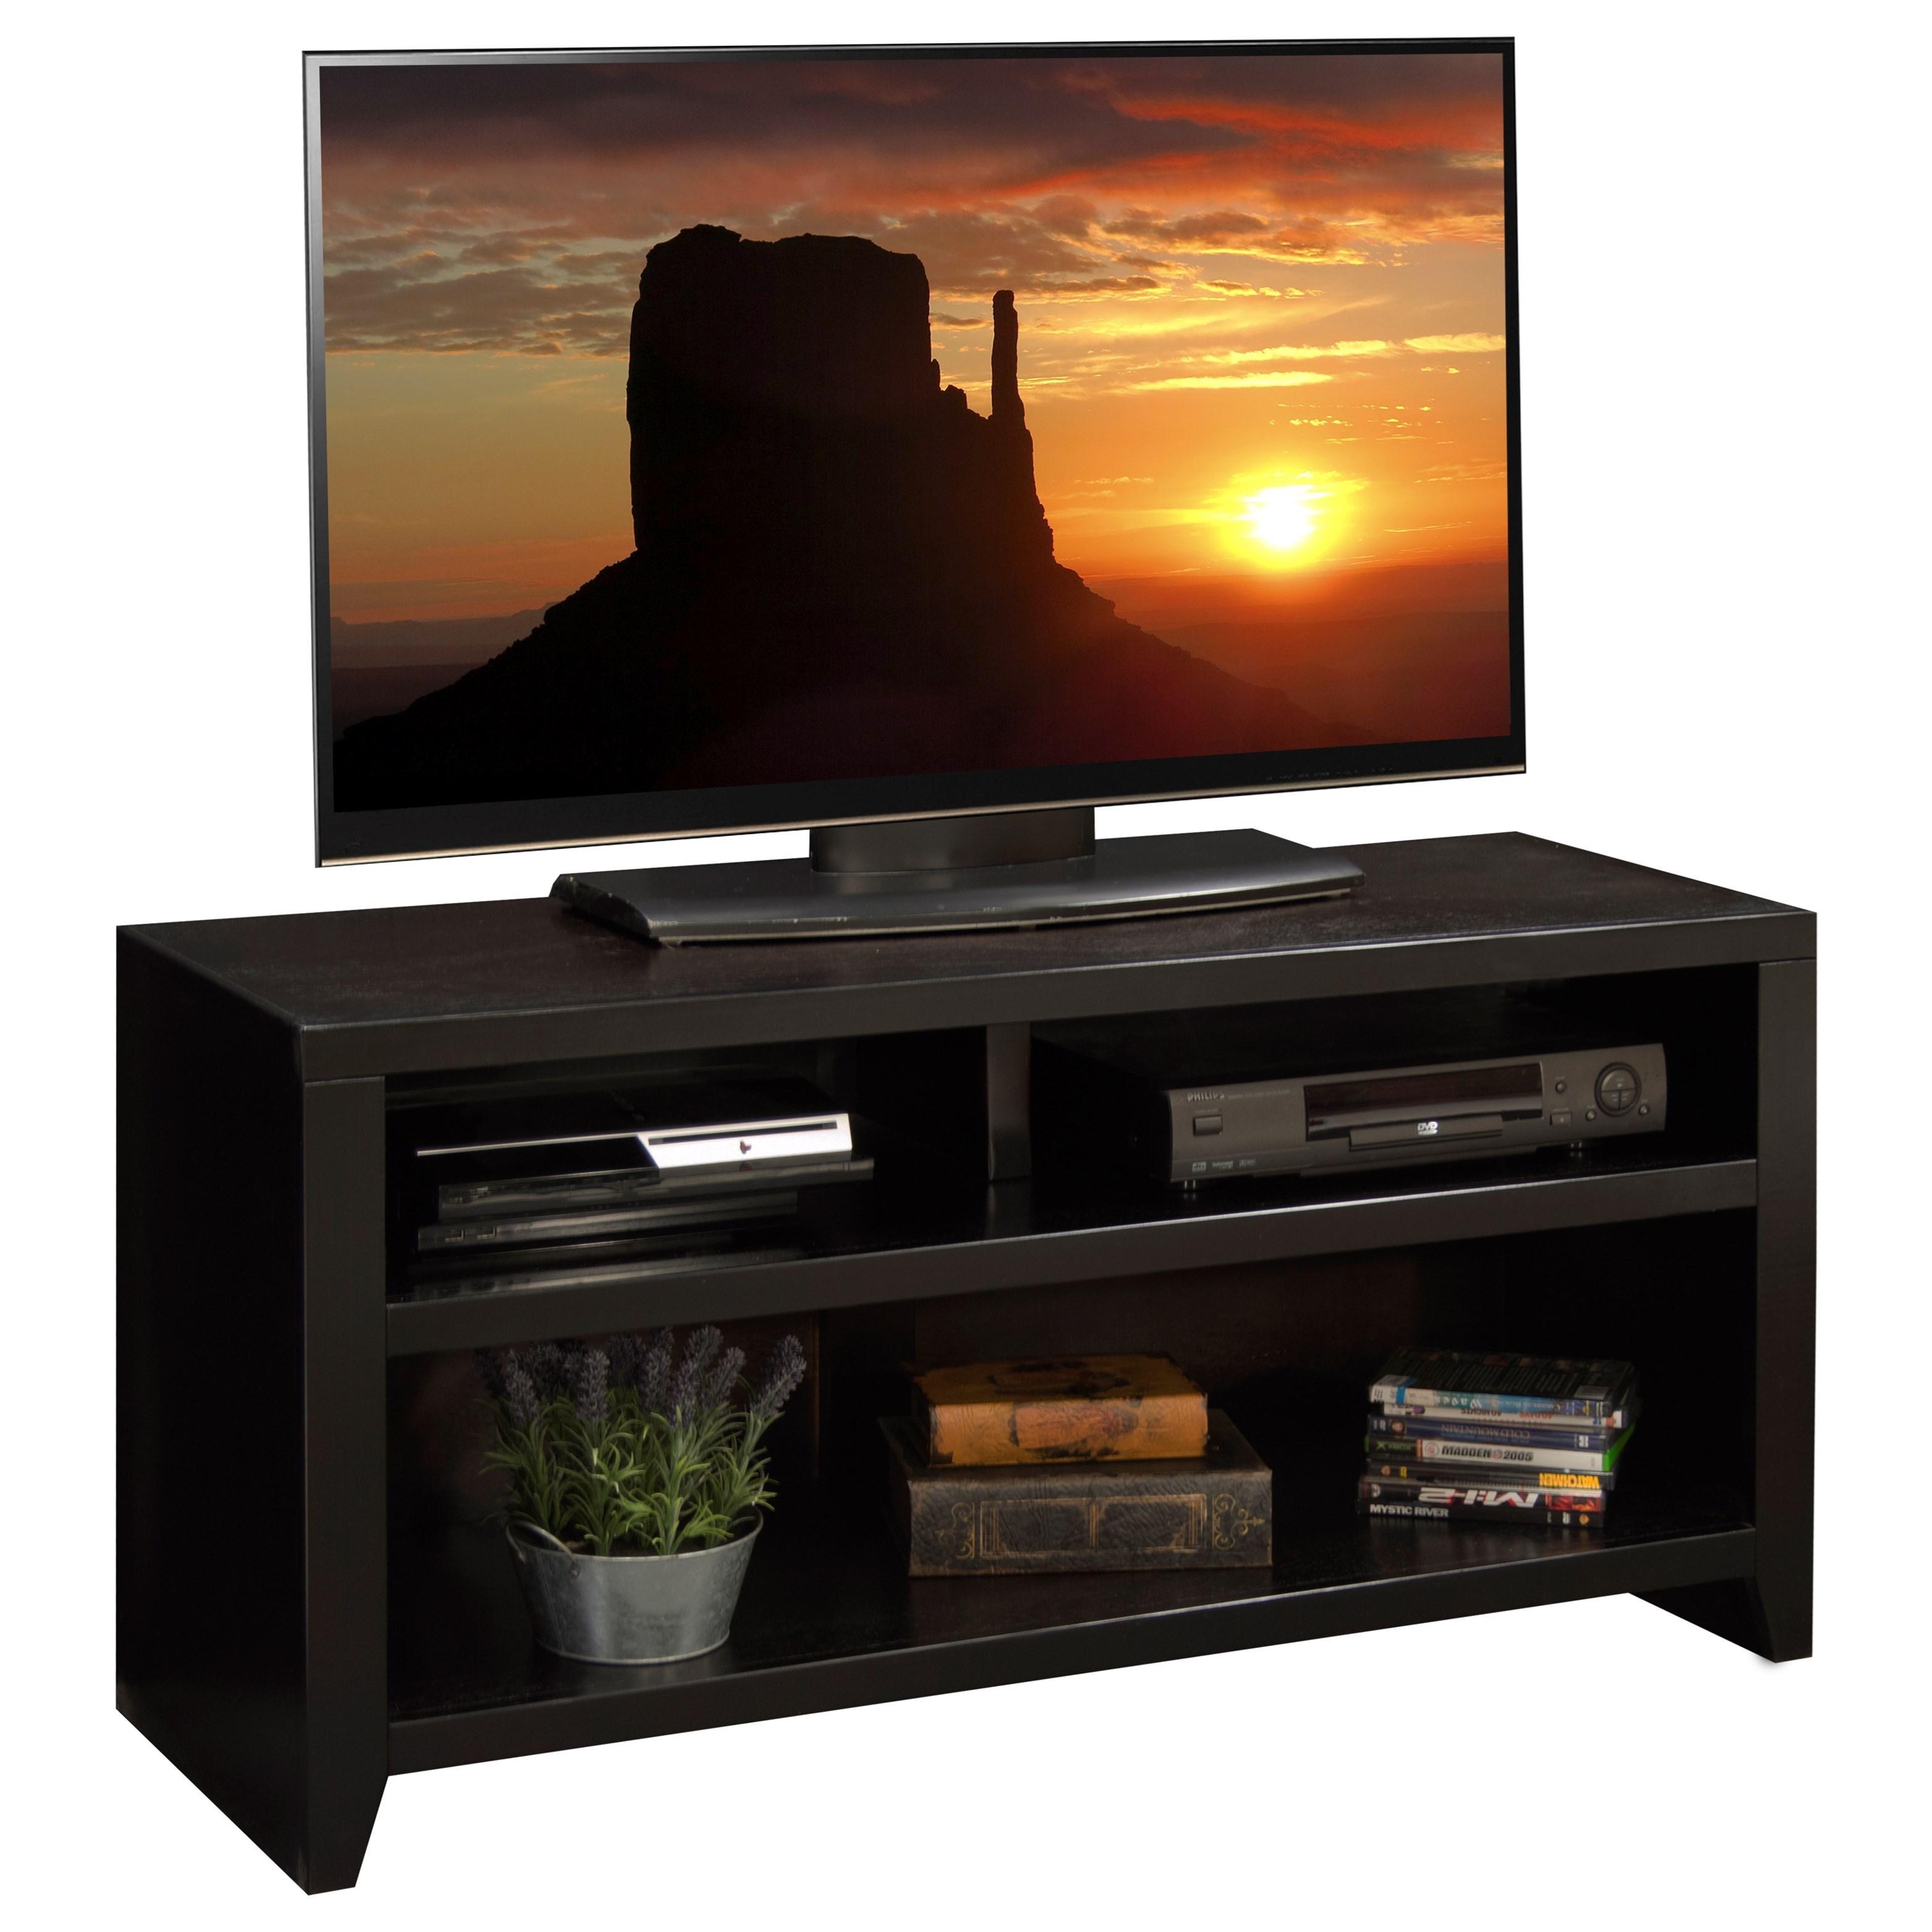 "Urban Loft 48"" TV Cart by Legends Furniture at VanDrie Home Furnishings"